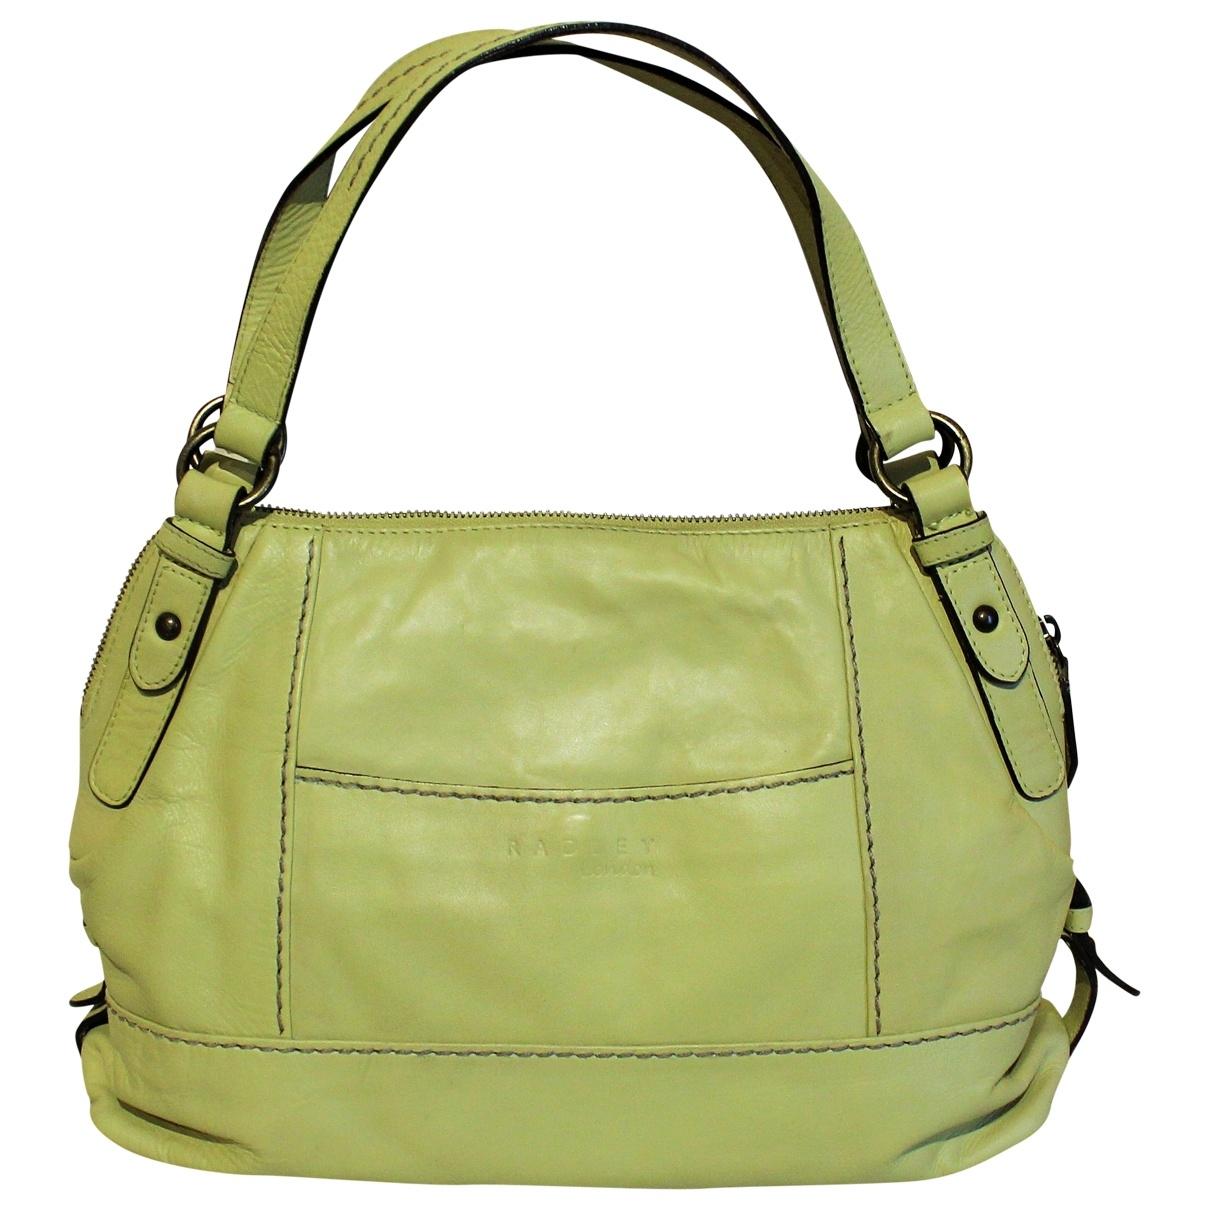 Radley London \N Handtasche in  Gruen Leder